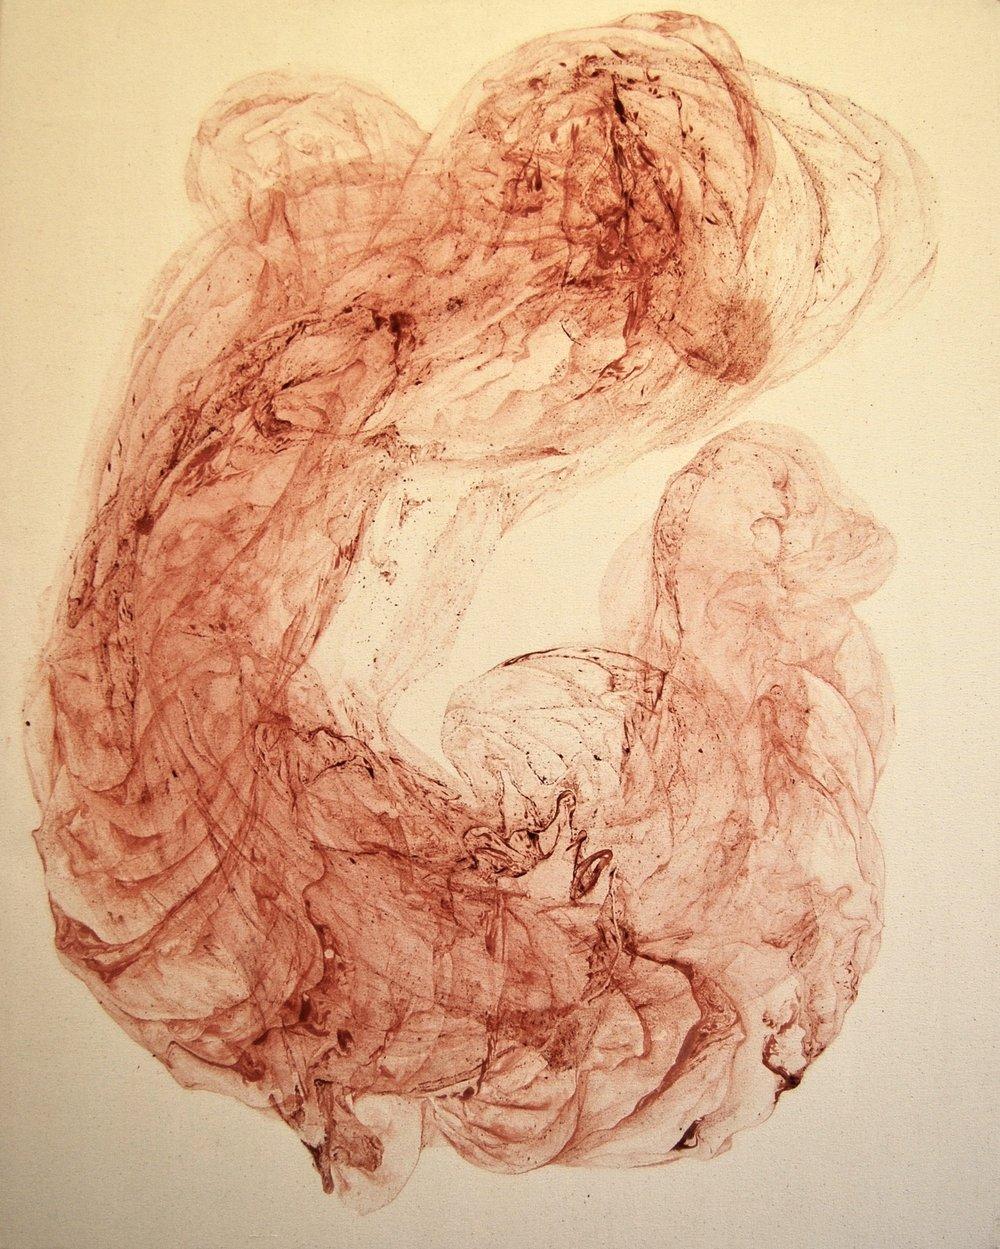 Odilia Suanzes, Untitled, Oxide pigment in canvas, 100 X 80 X 4 cm,  http://www.odiliasuazes.com